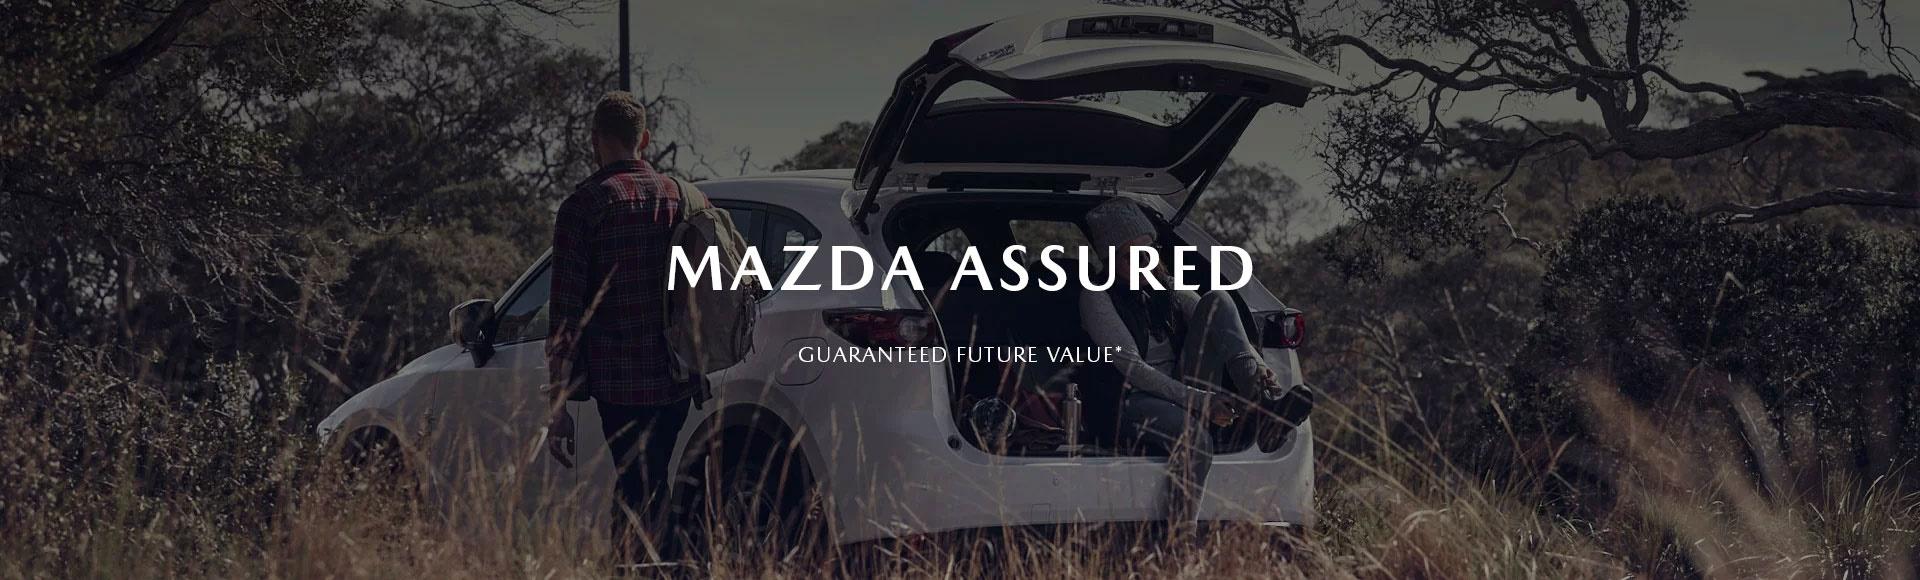 Mazda Assured